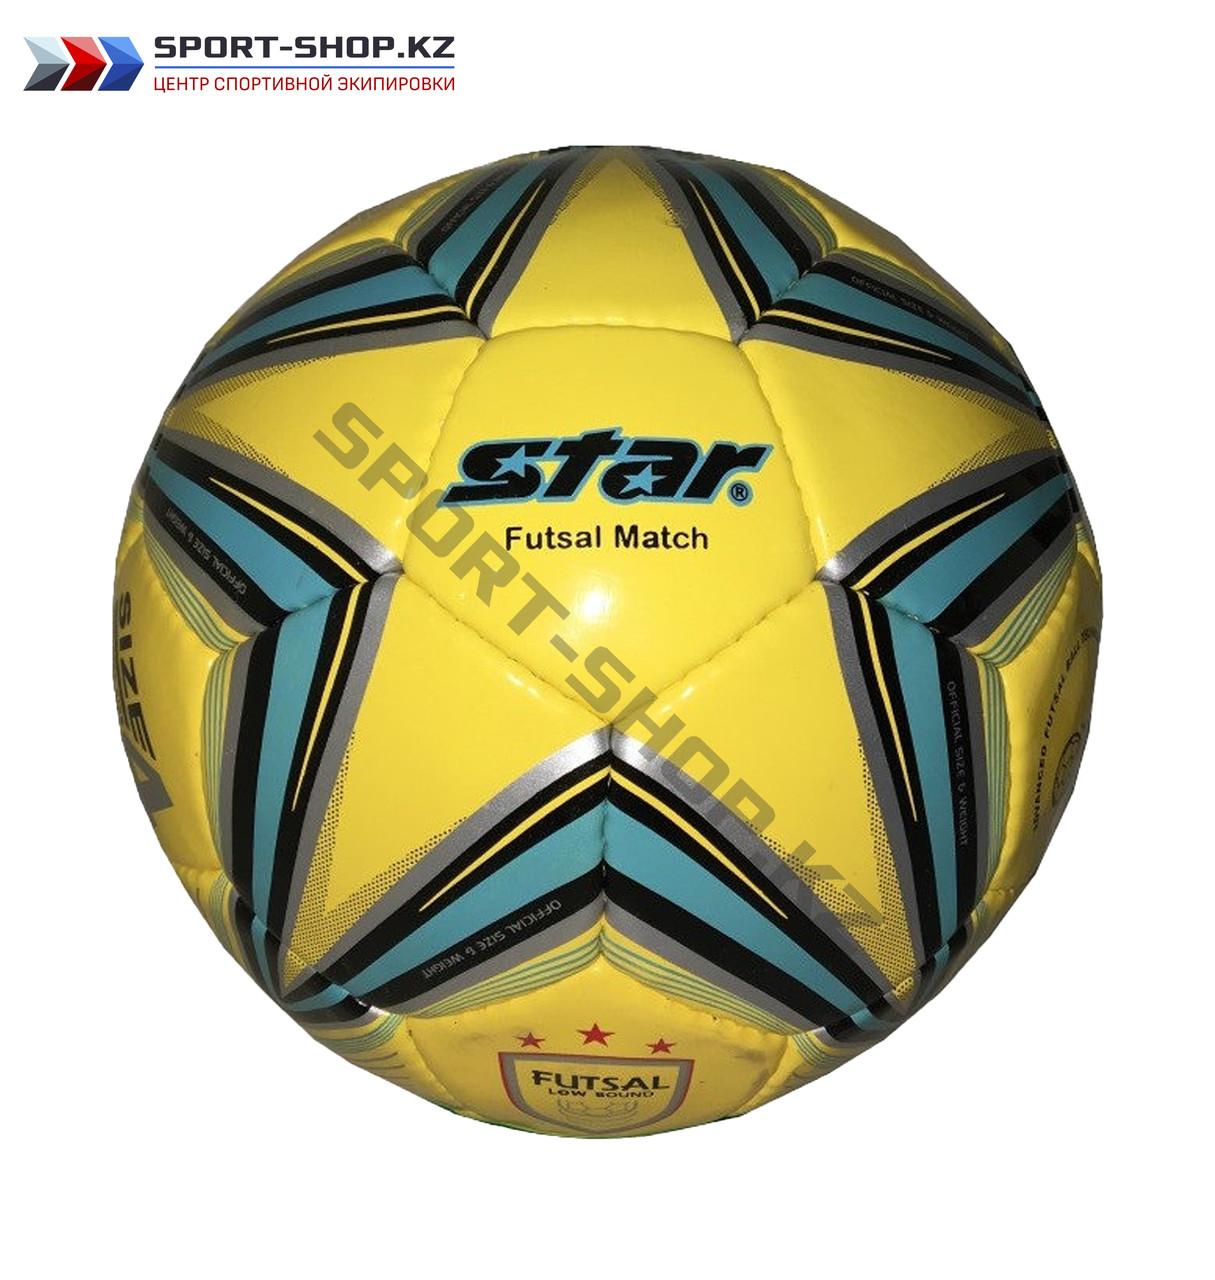 Футзальный мяч Star FB 524-05